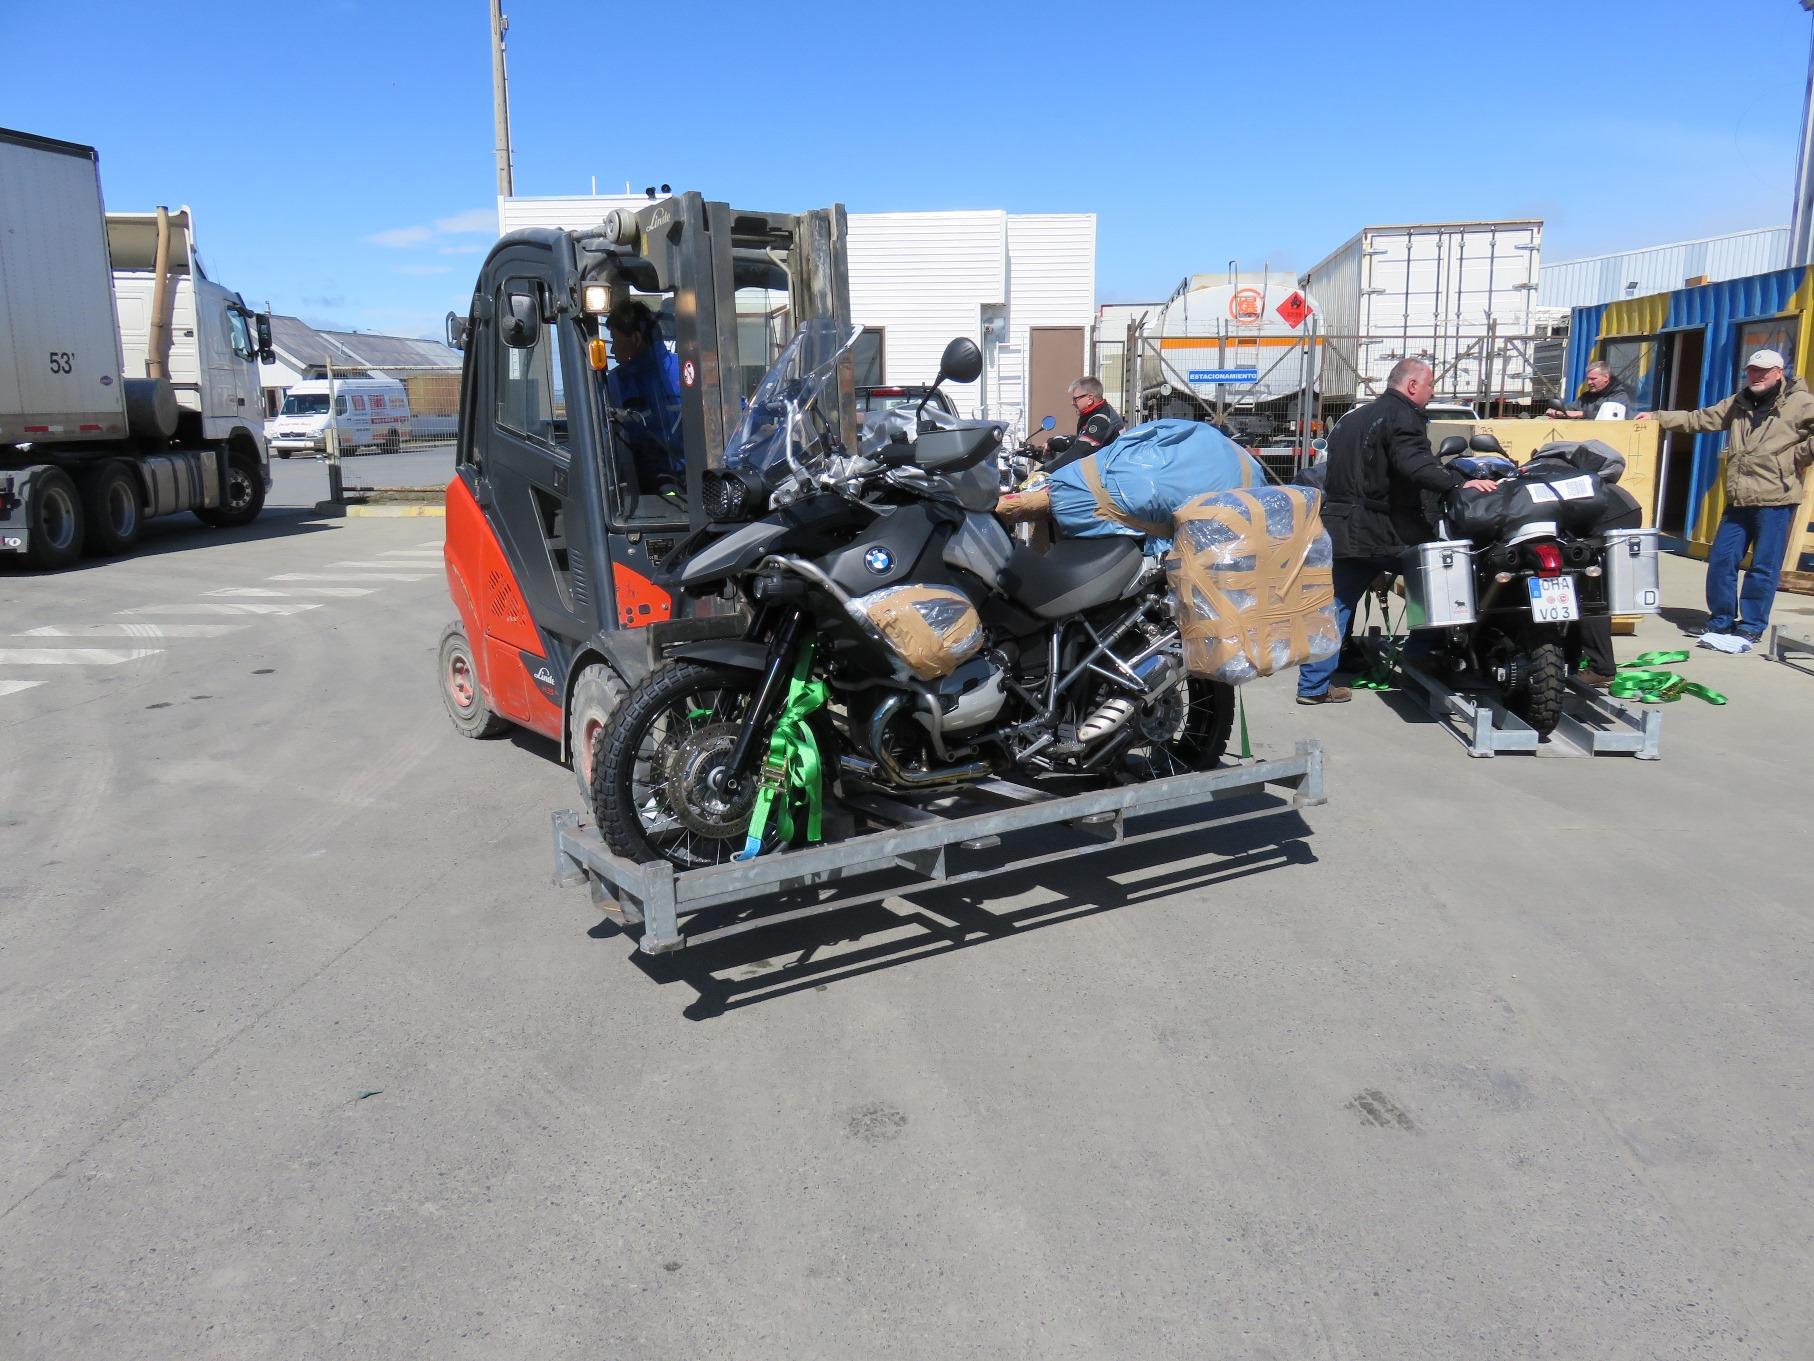 Ankunft Moped7